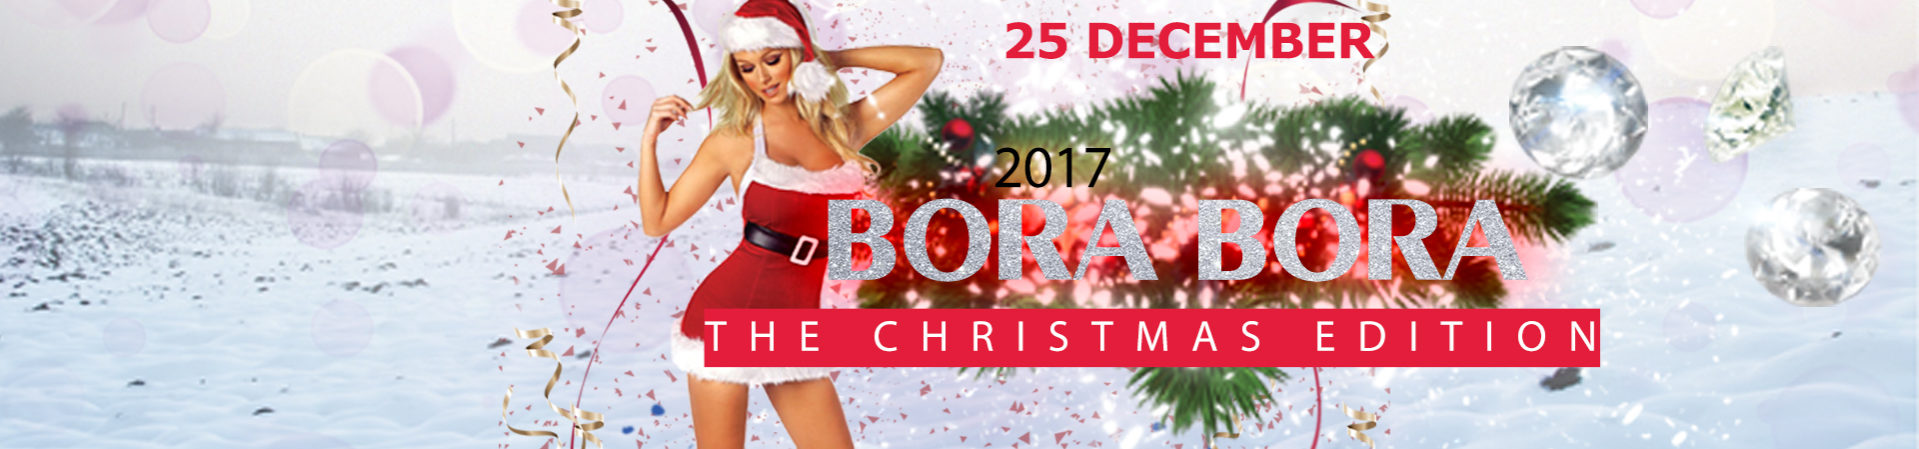 Bora Bora Christmas Edition